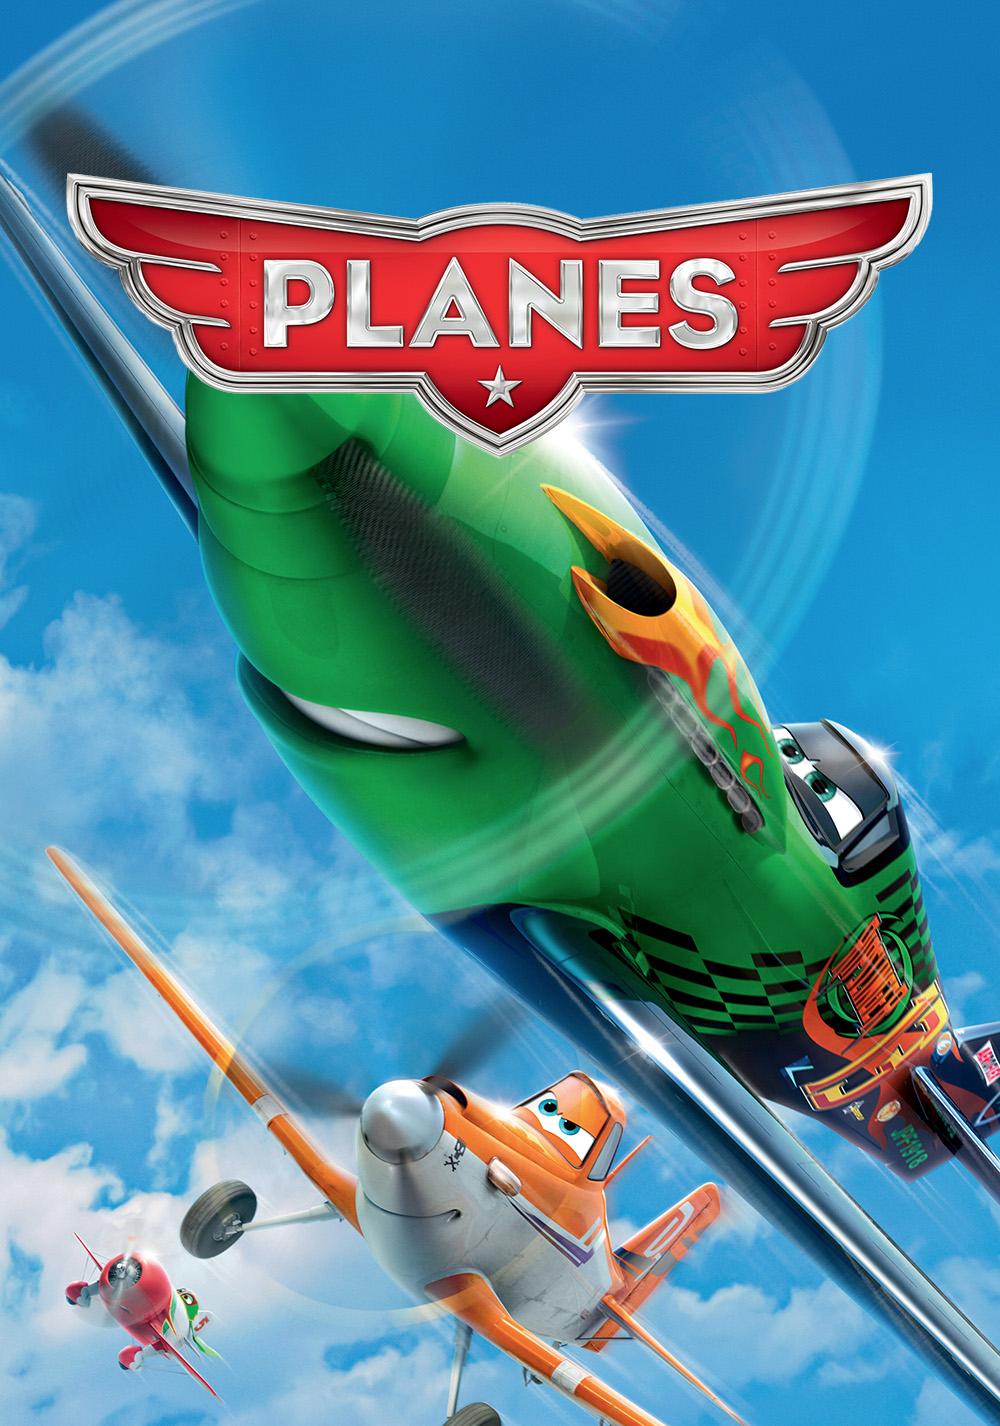 Planes | Movie fanart | fanart.tv Planes Movie Poster